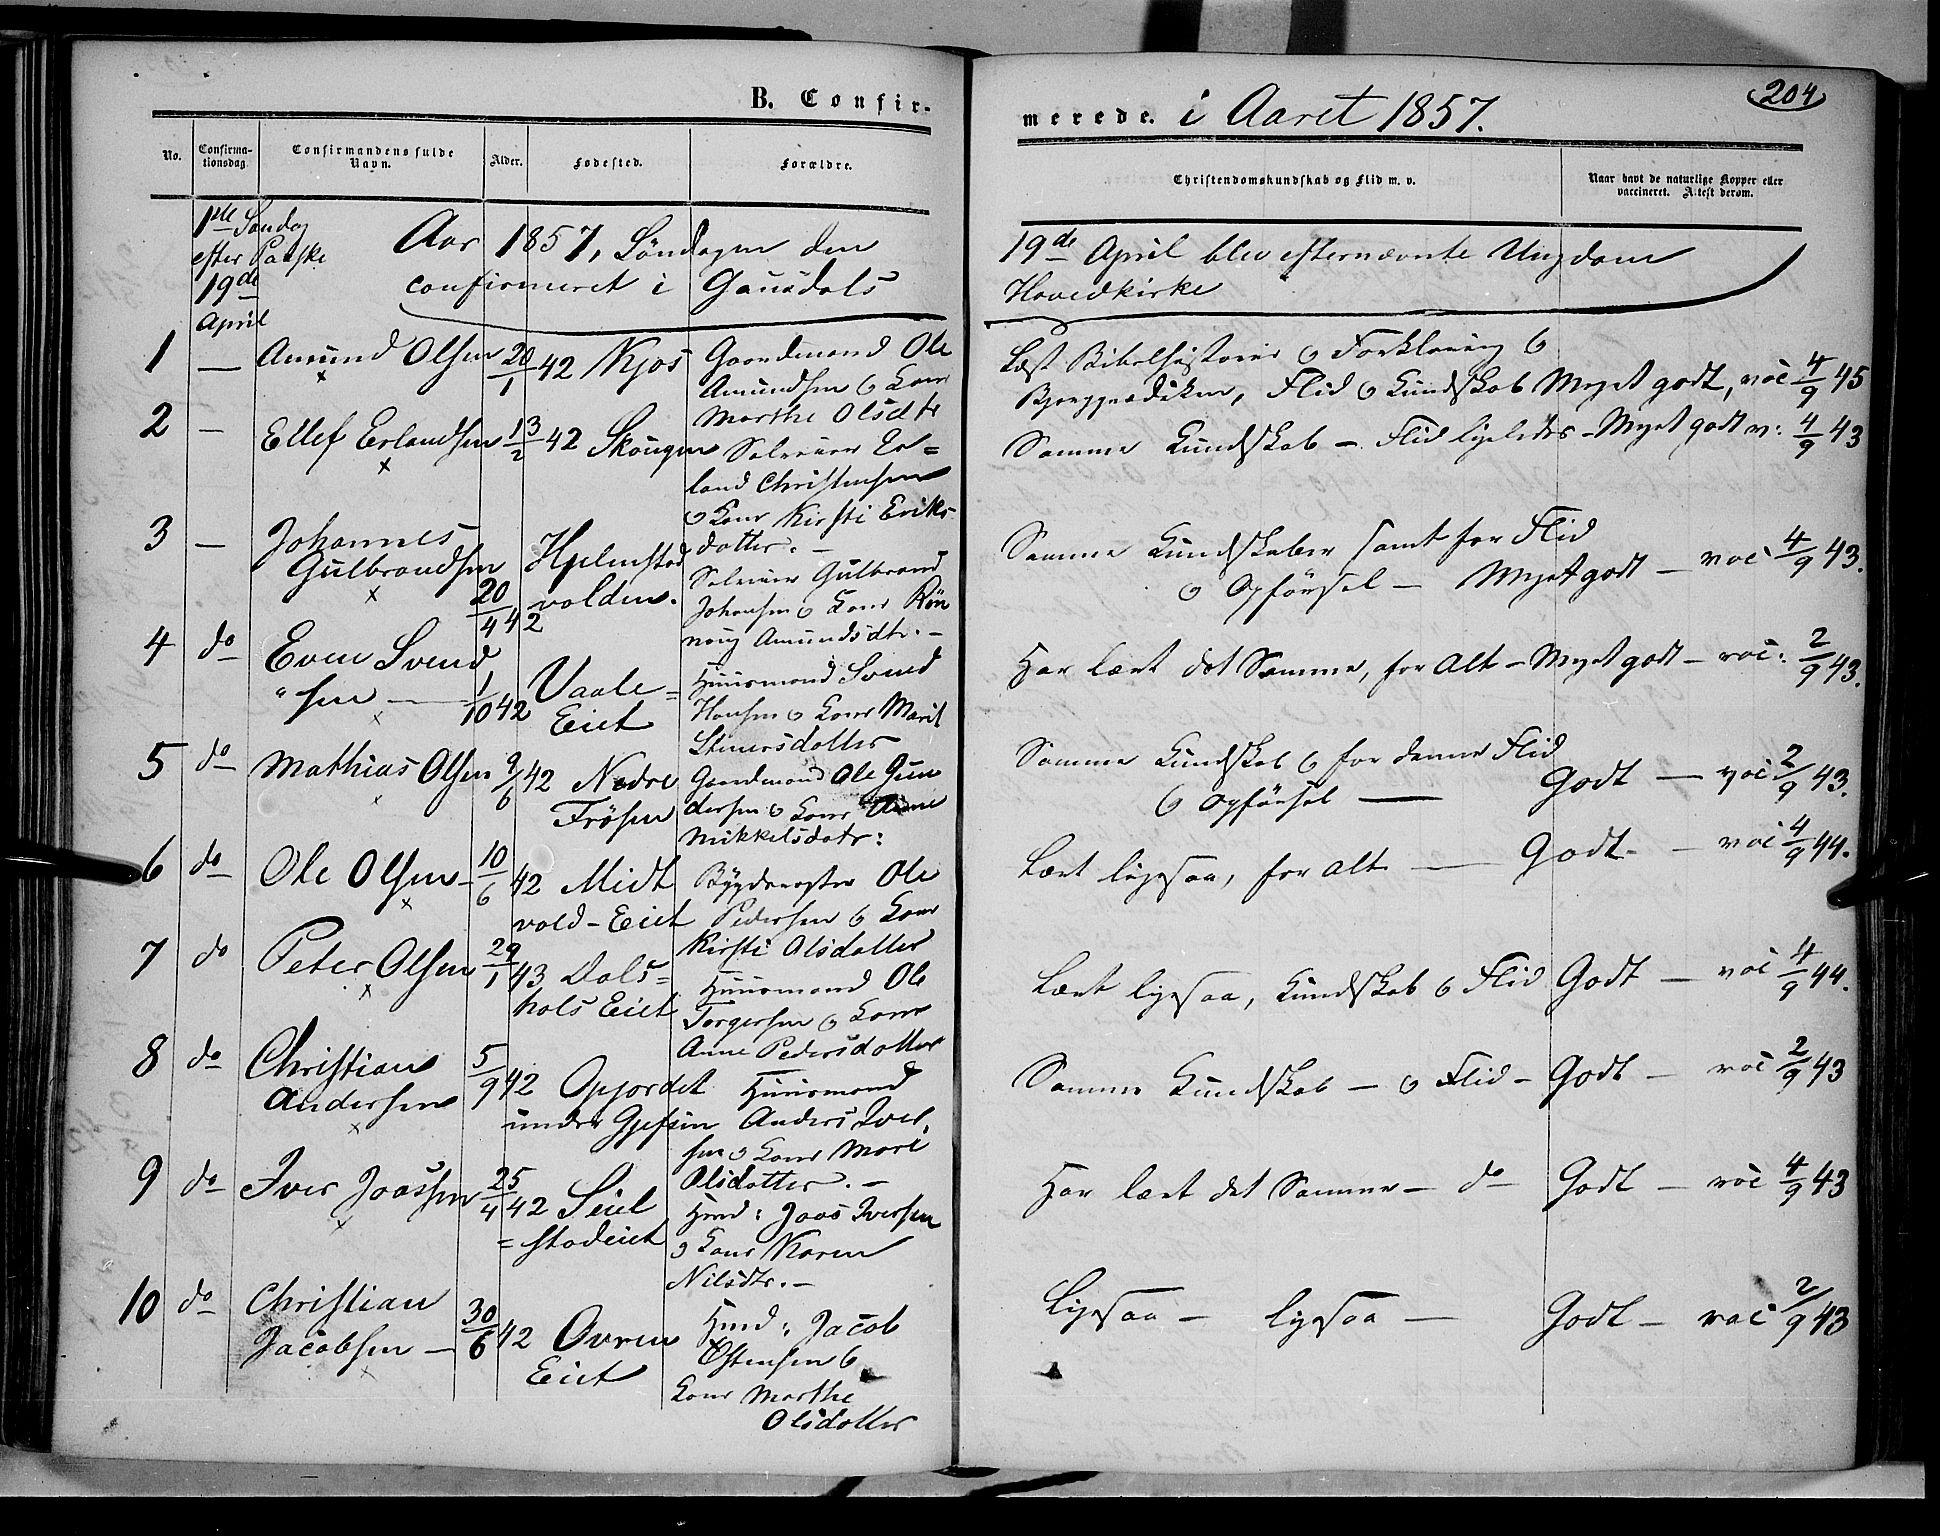 SAH, Gausdal prestekontor, Ministerialbok nr. 8, 1850-1861, s. 204